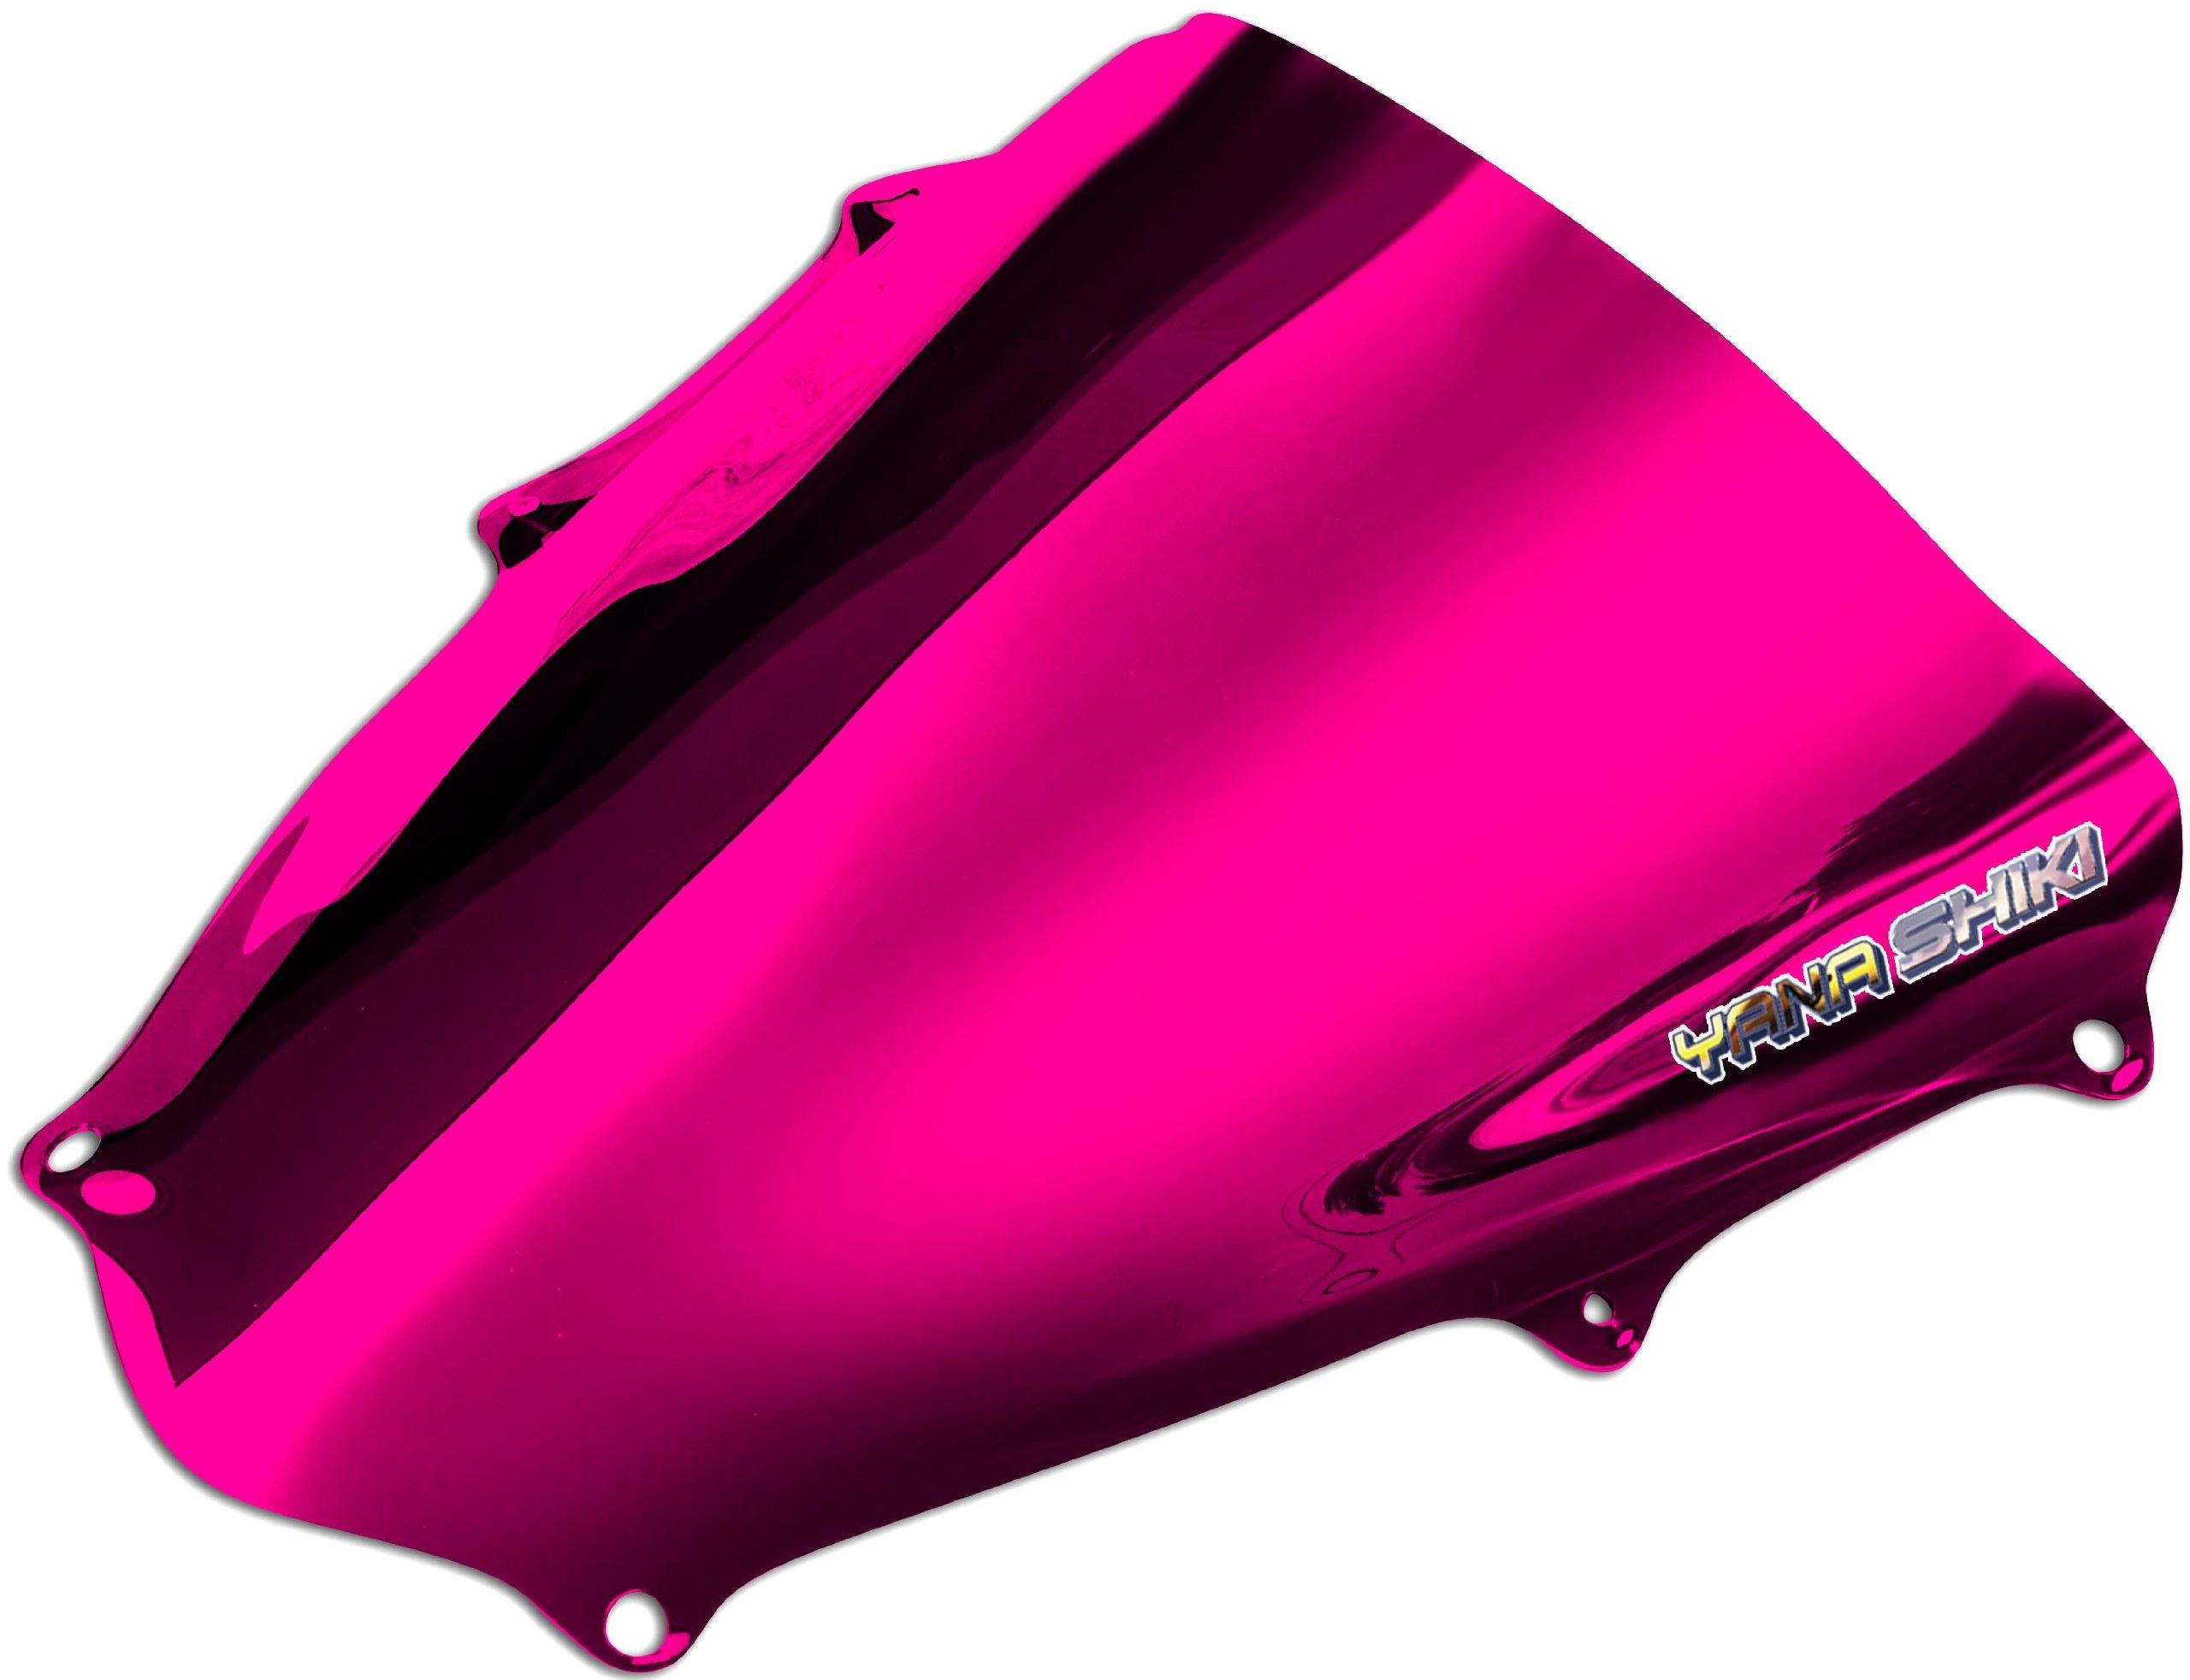 Yana Shiki SW-2012CRE R Series Chrome Red Windscreen for Suzuki GSX-R 1000